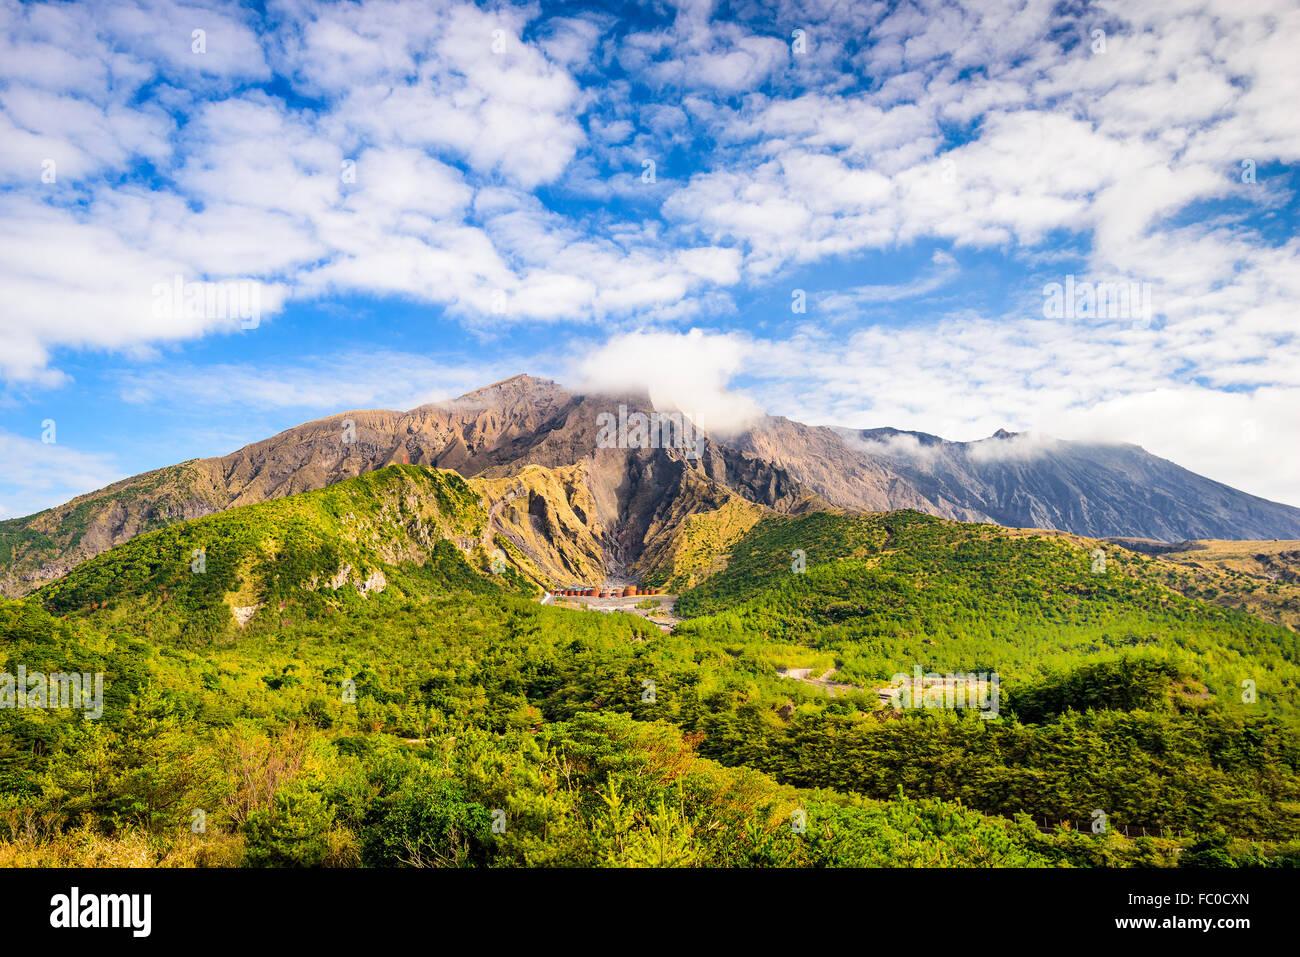 Sakurajima Volcano Crater in Kagoshima, Japan. - Stock Image